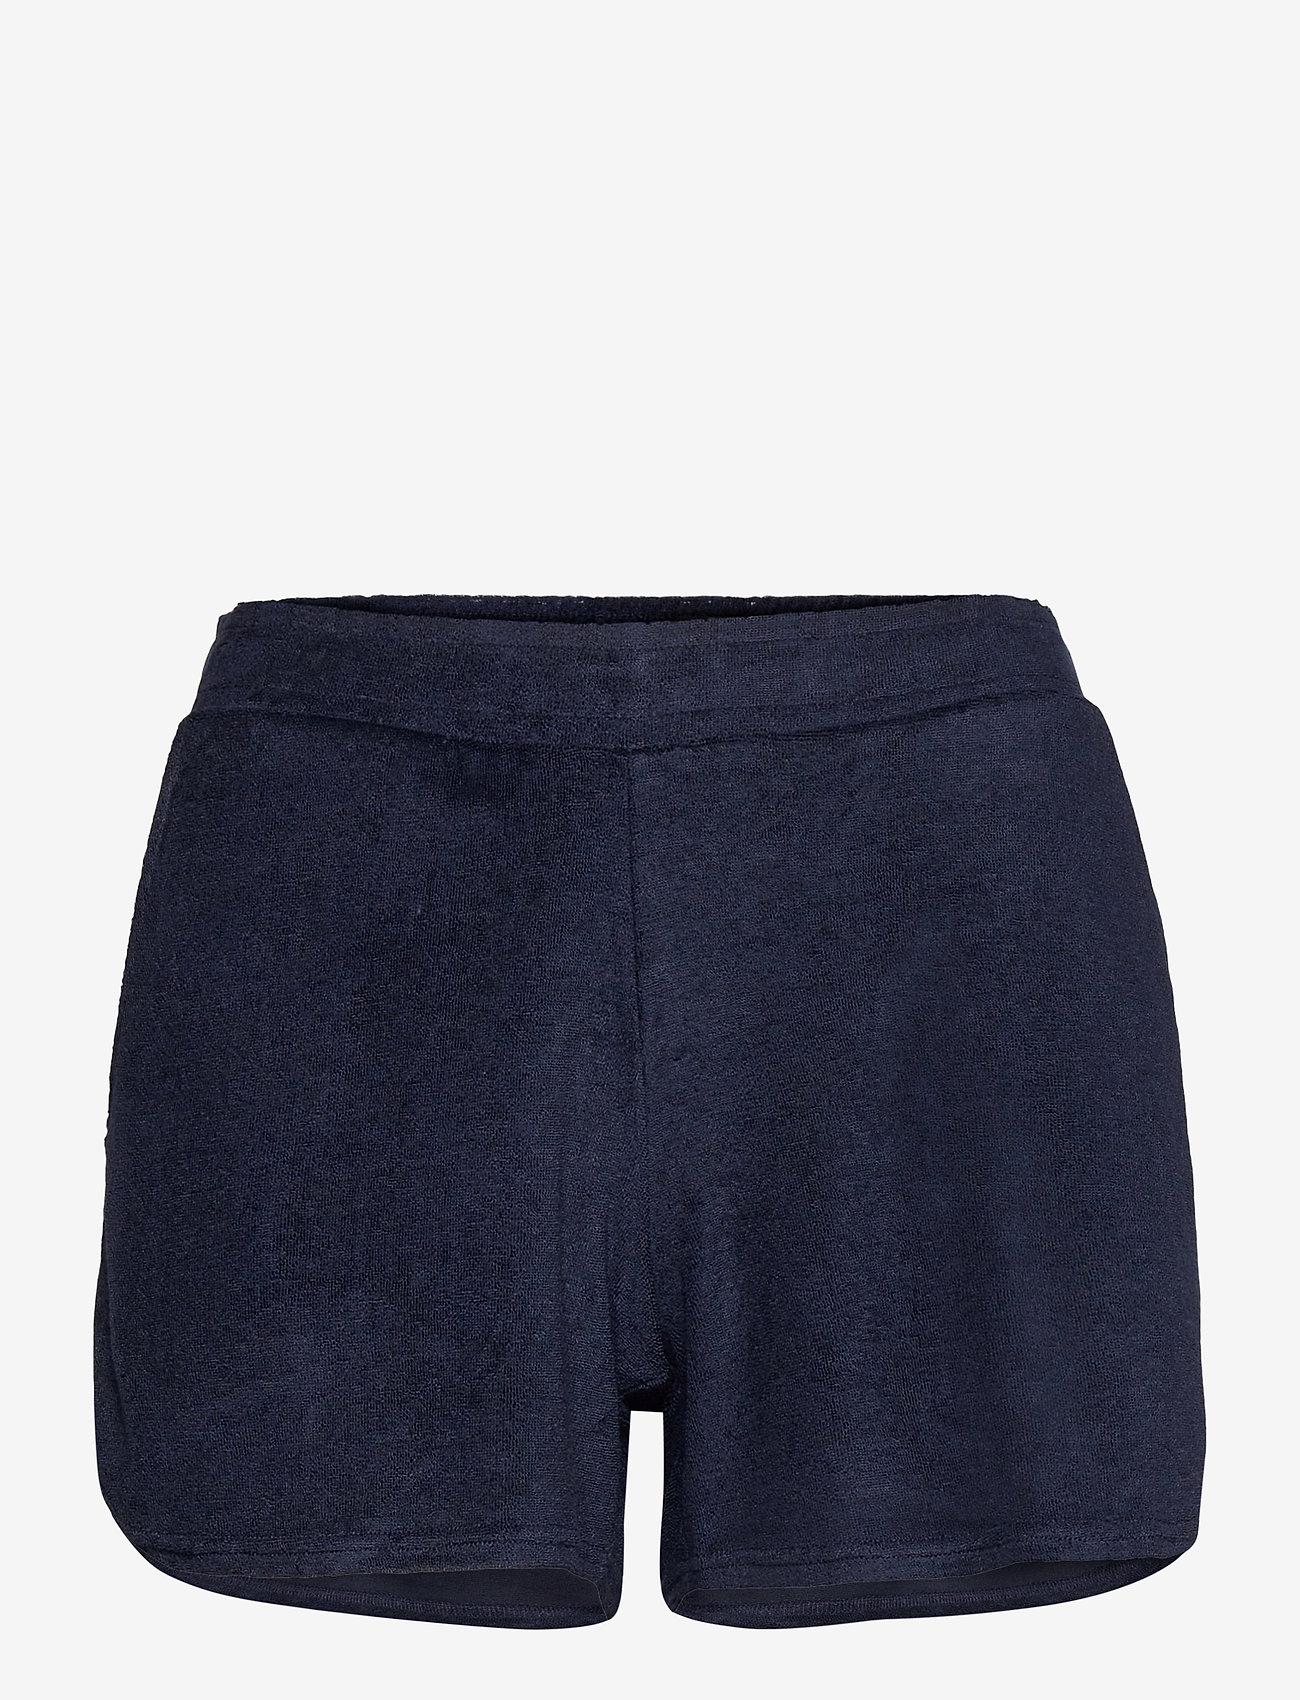 Schiesser - Shorts - shorts casual - nightblue - 0